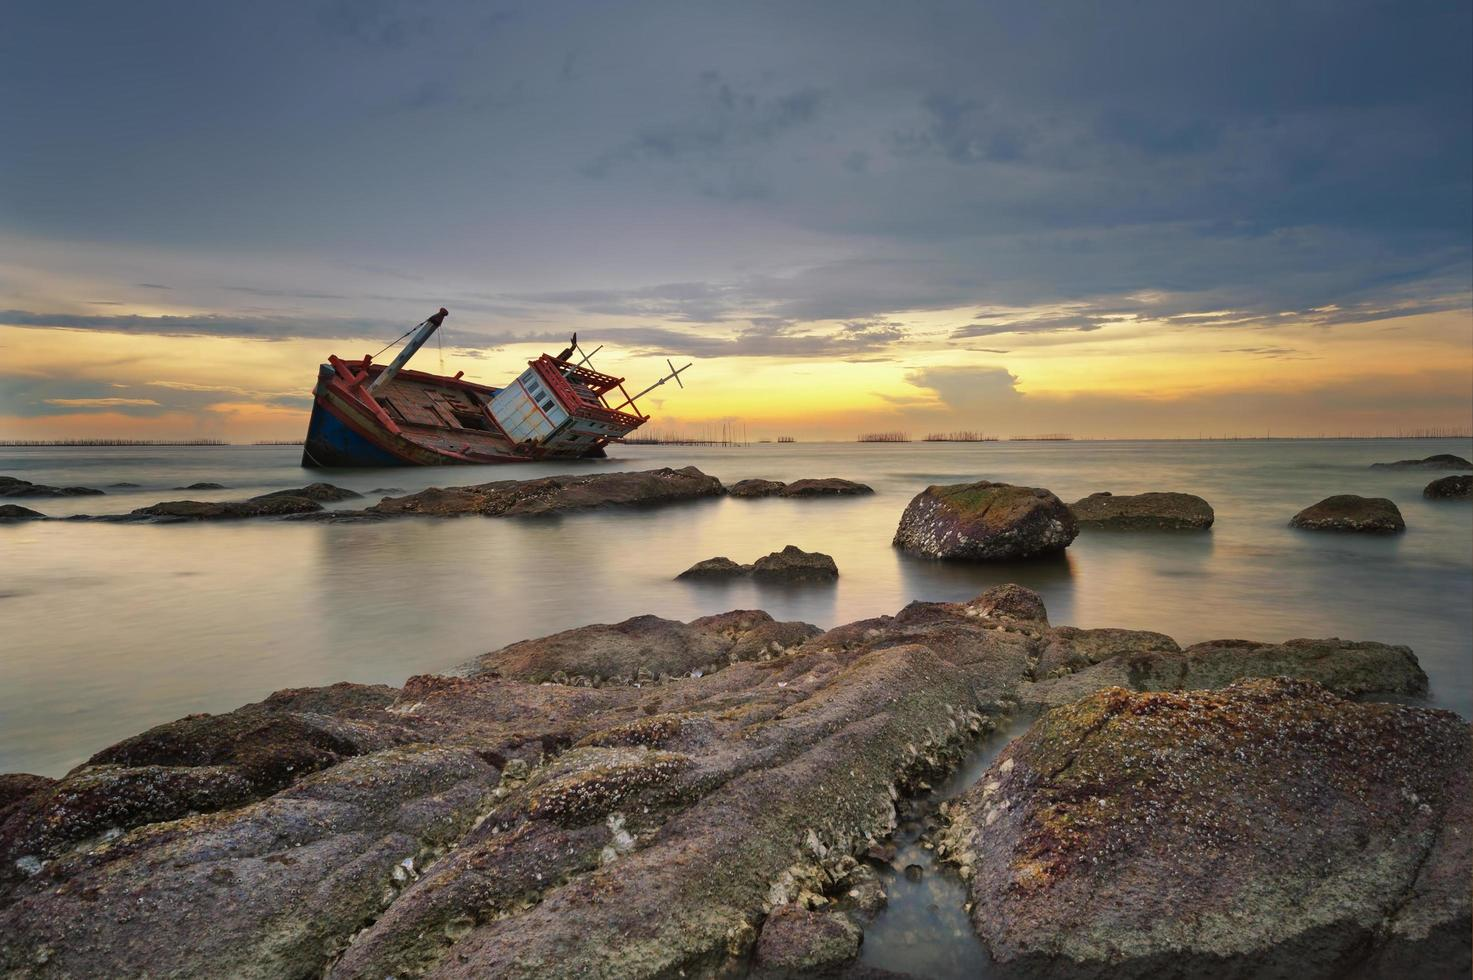 Shipwrecked boat at sunset photo